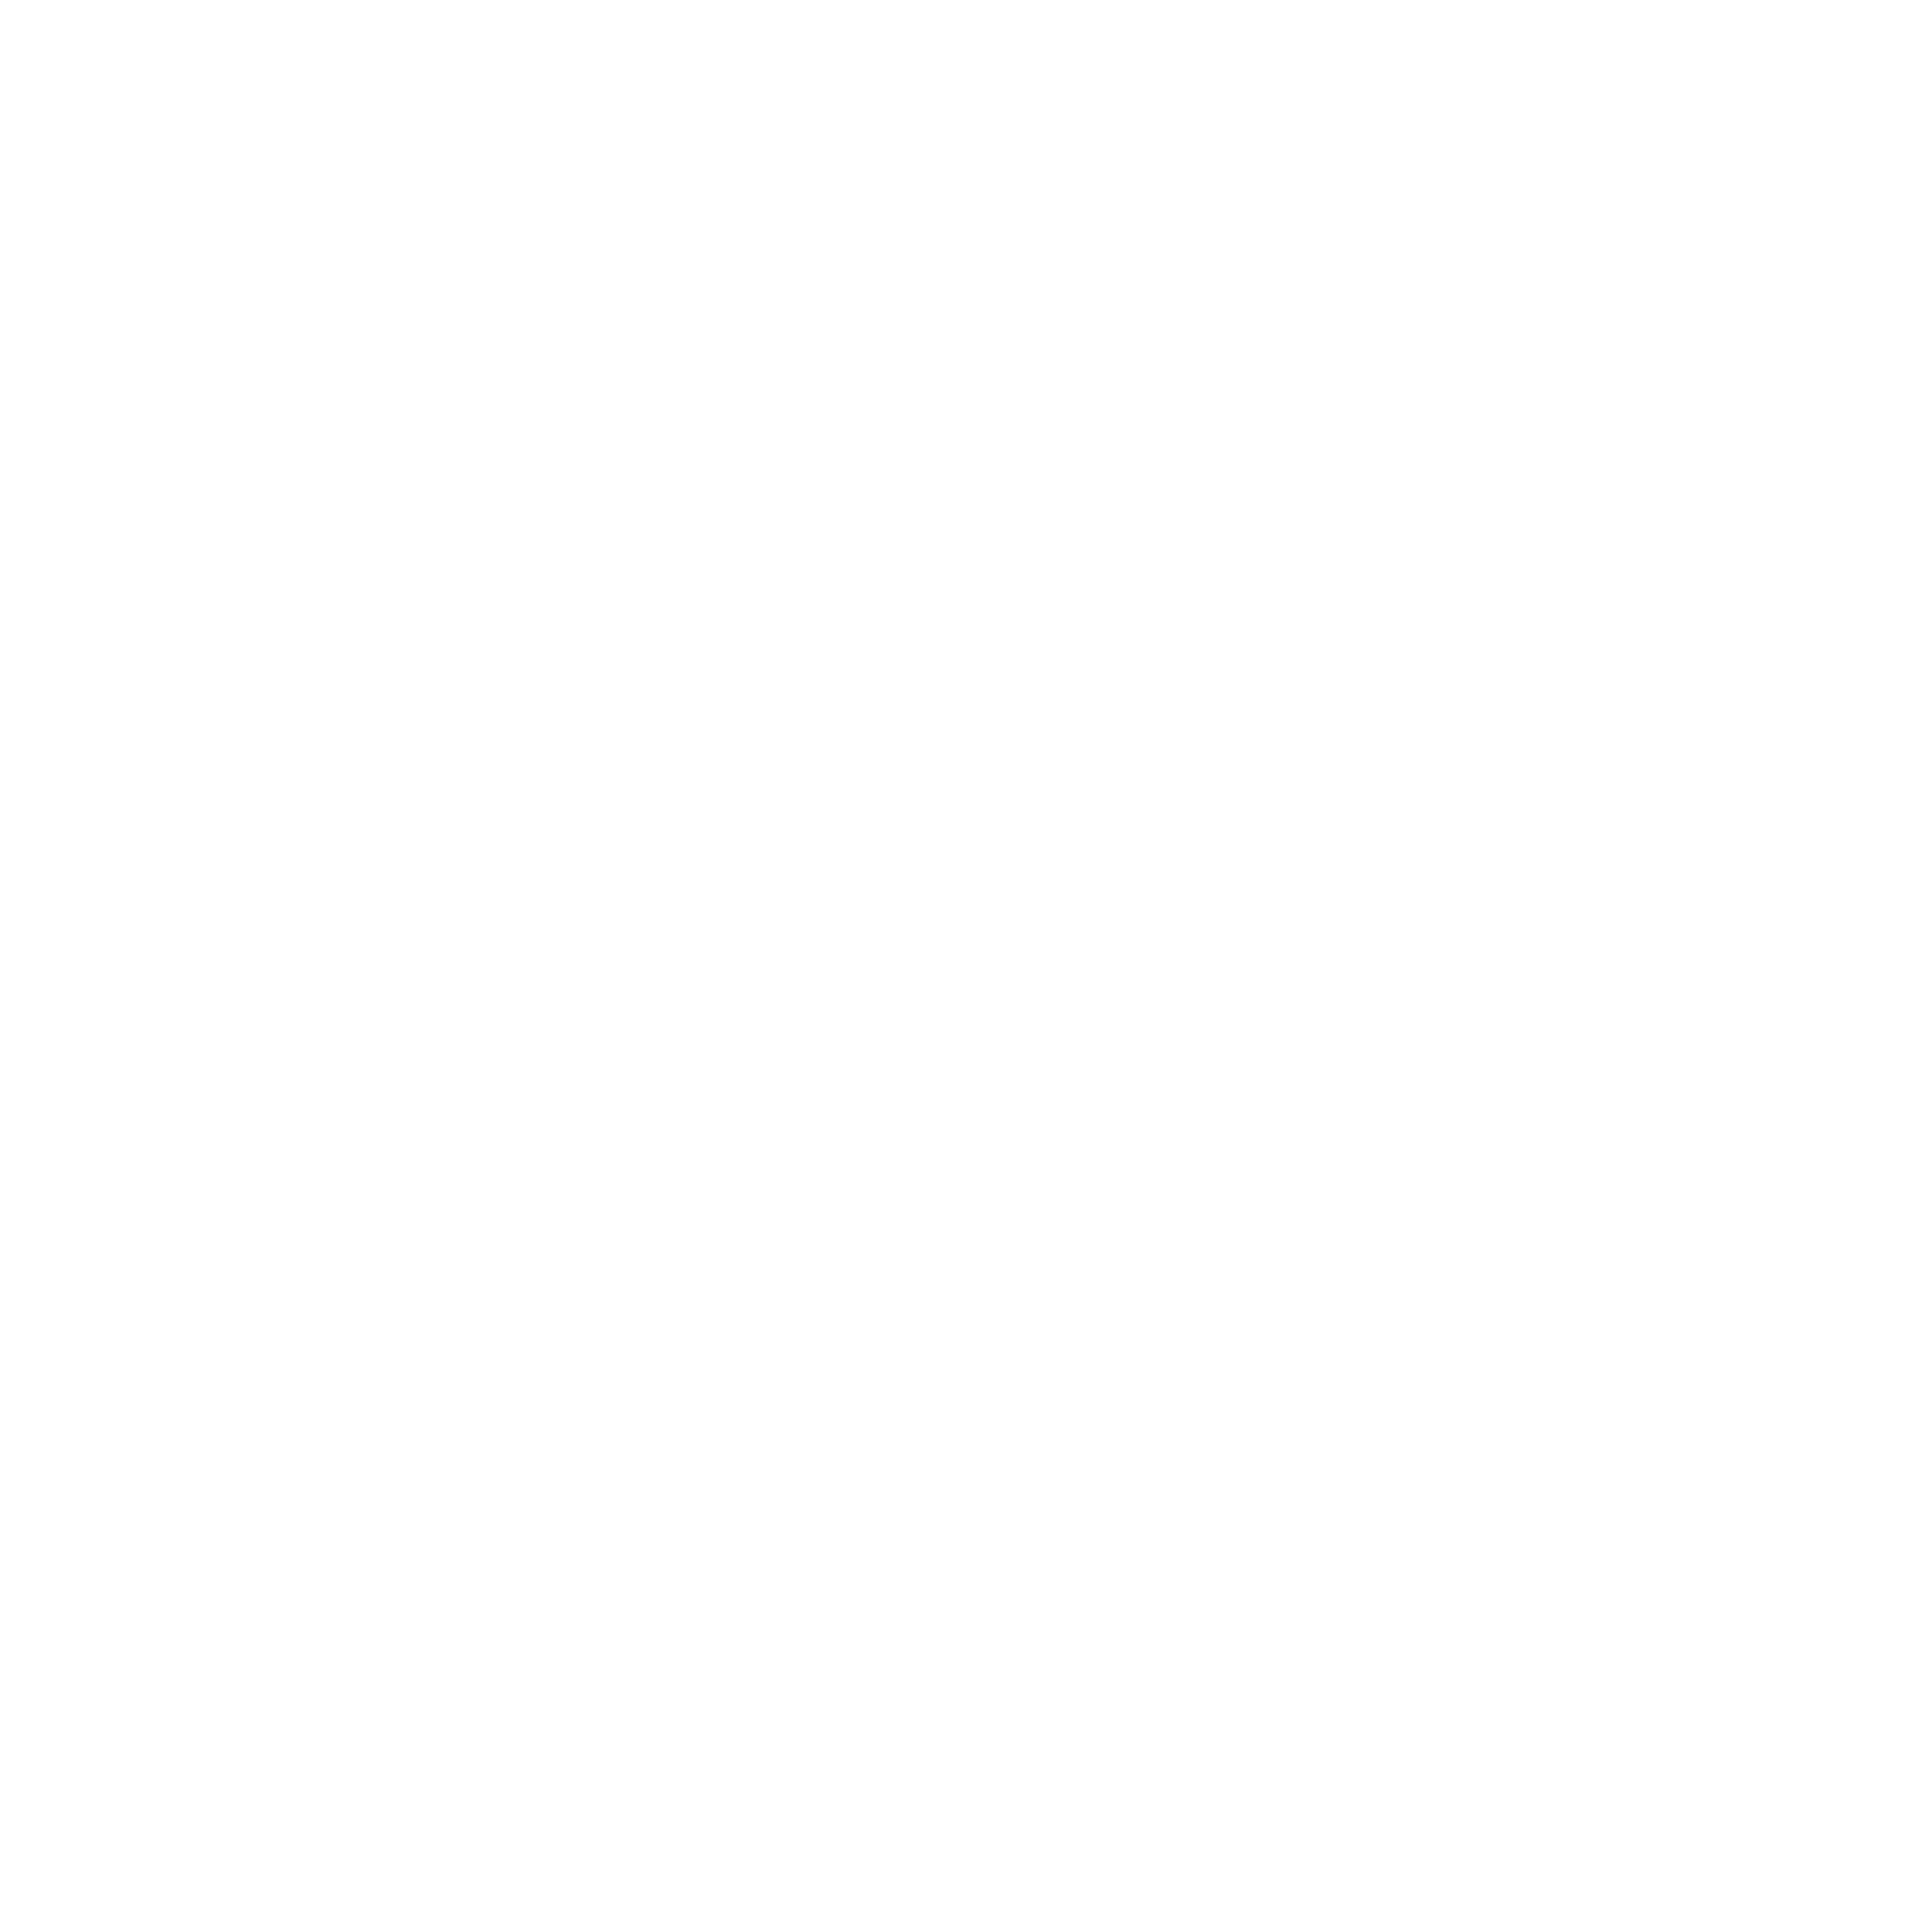 World Customs Organization Logo PNG Transparent & SVG ...